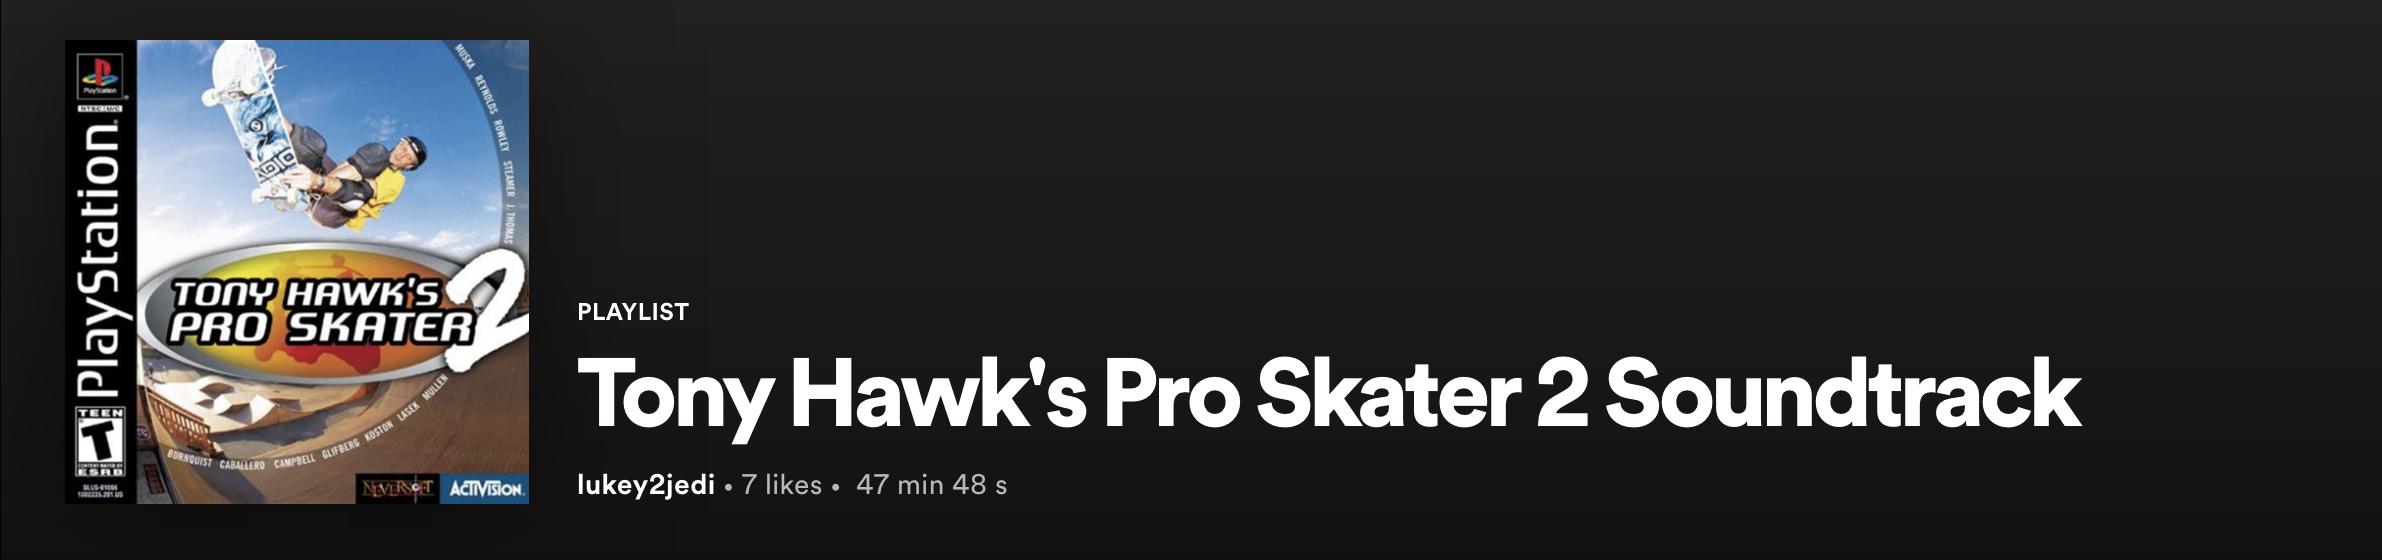 Tony Hawk Pro Skater 2 Spotify